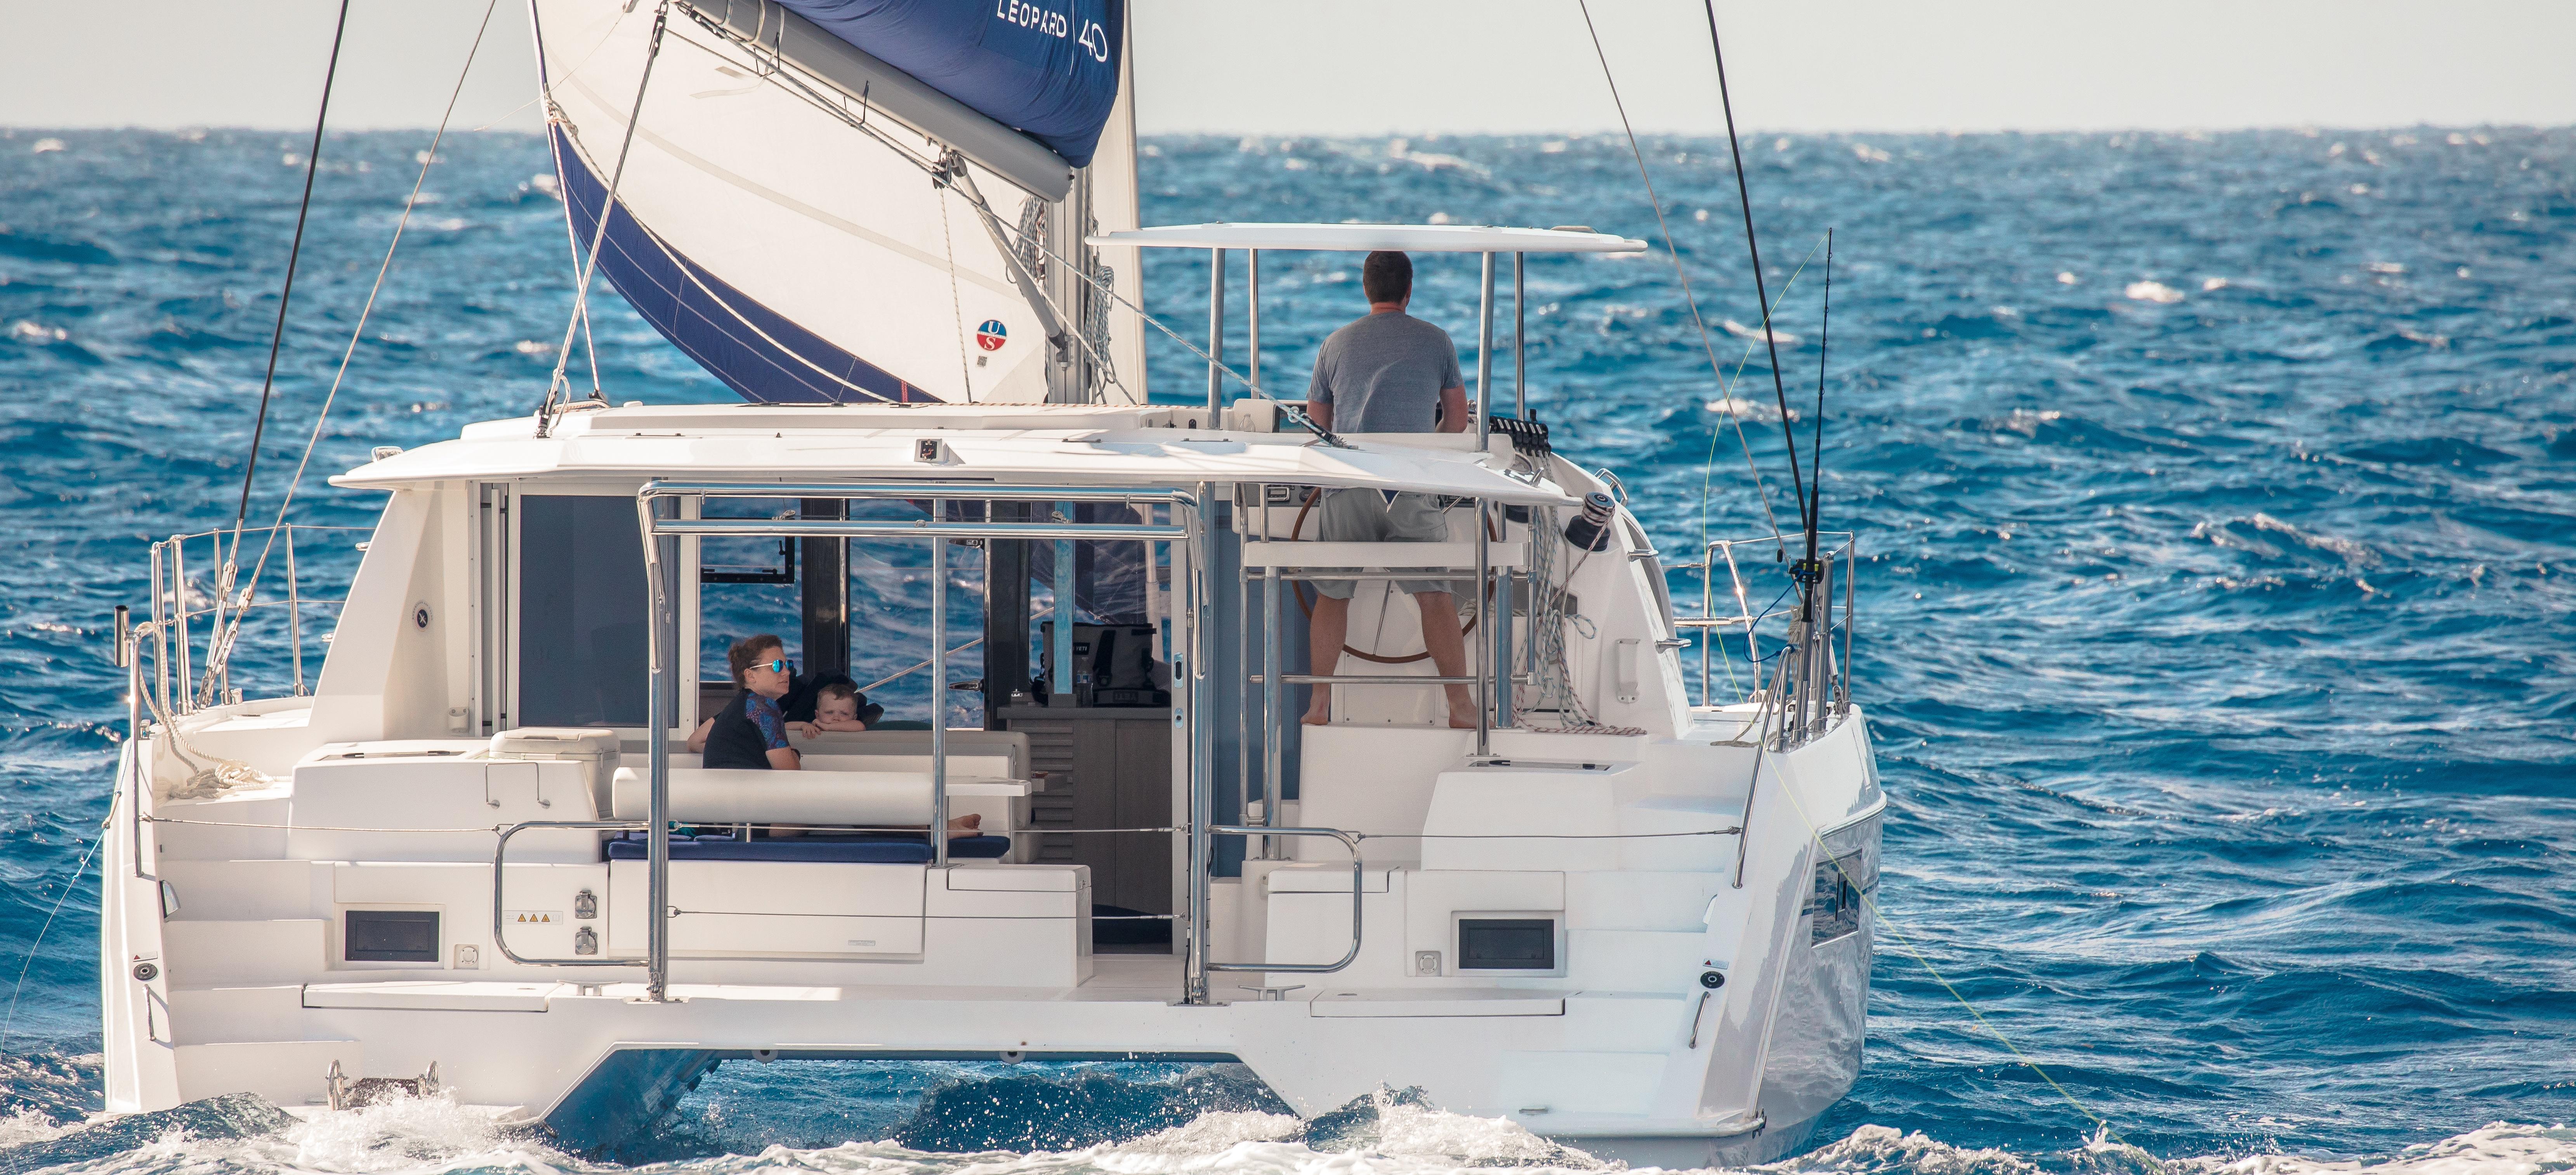 Bahamas-KZ6A1380-L40-Fam